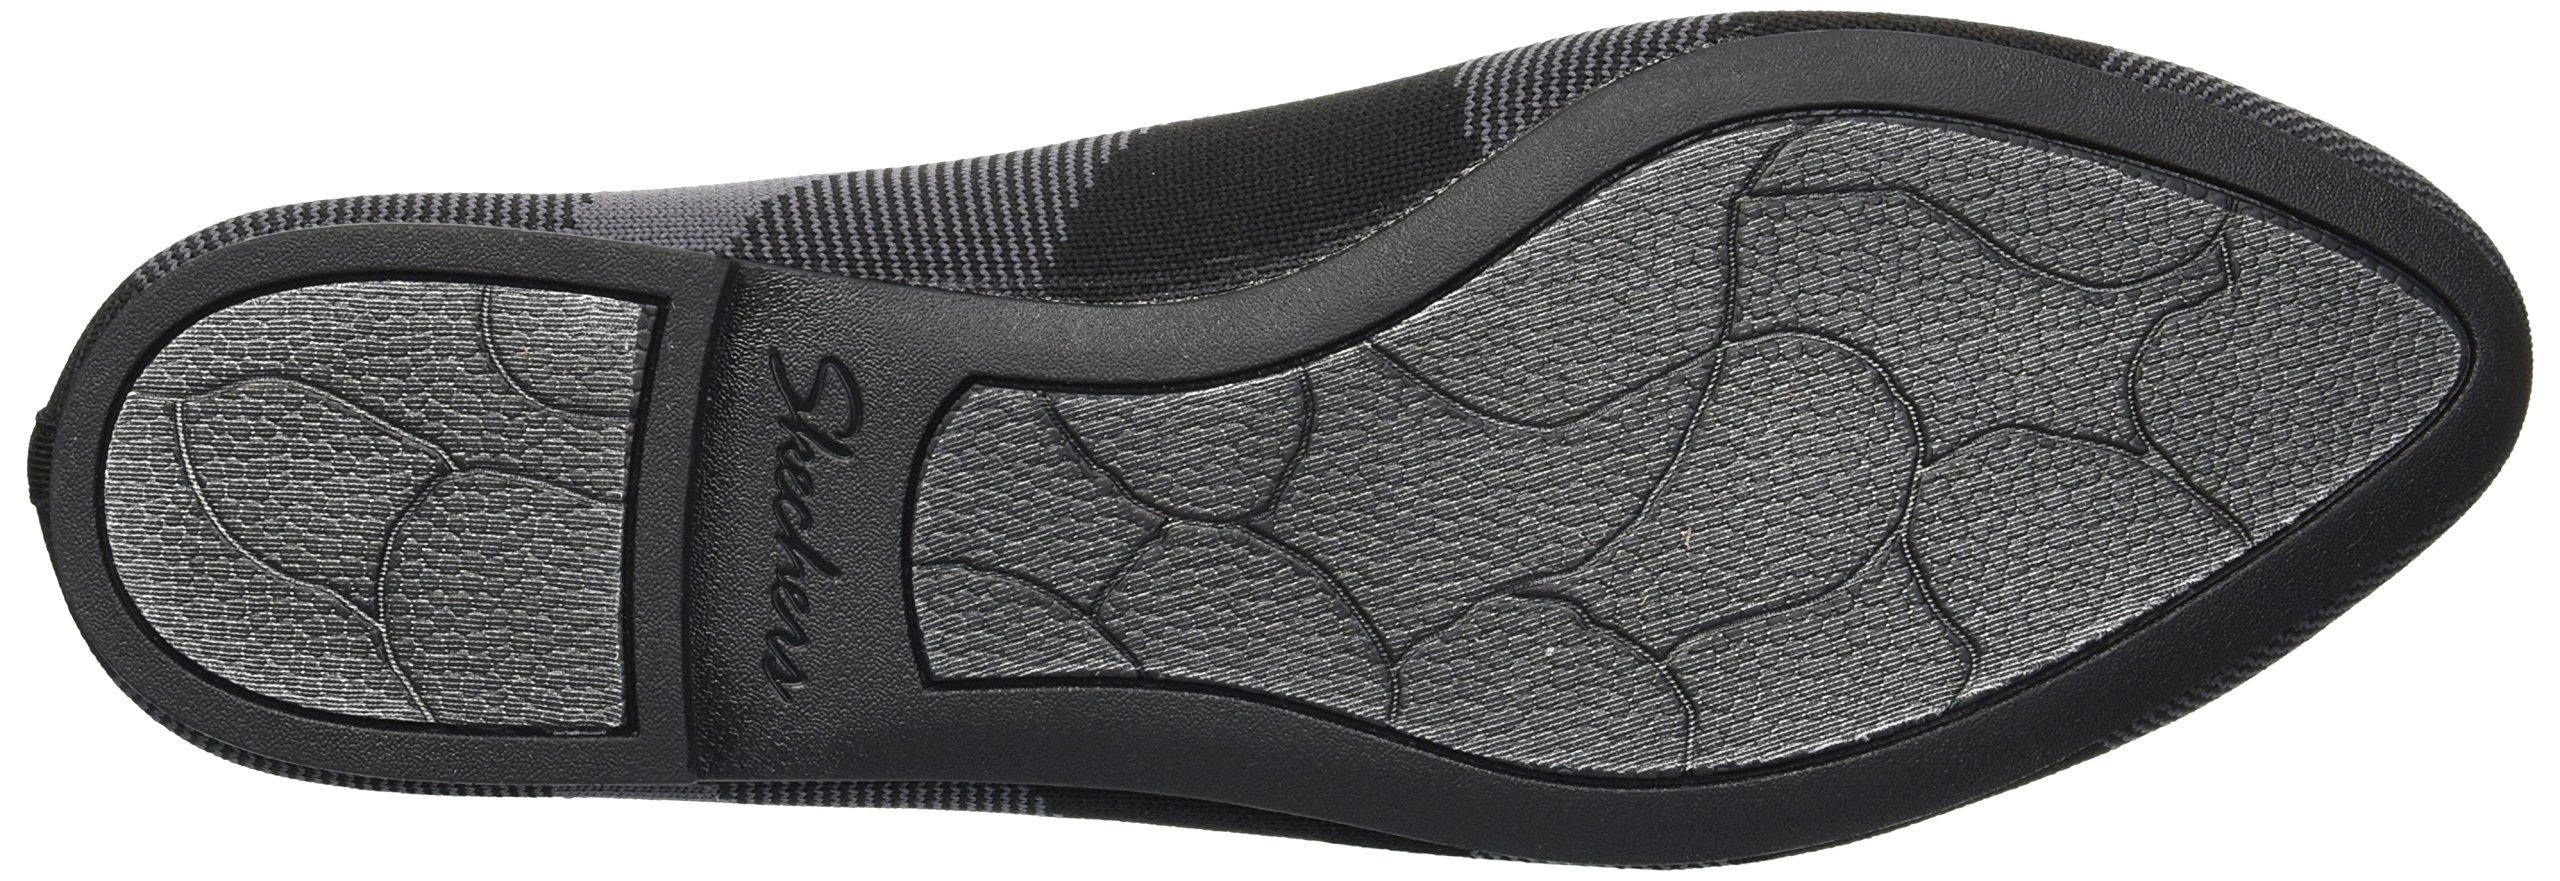 Skechers Women's Cleo-Sherlock-Engineered Knit Loafer Skimmer Ballet Flat, Black, 6.5 M US by Skechers (Image #3)